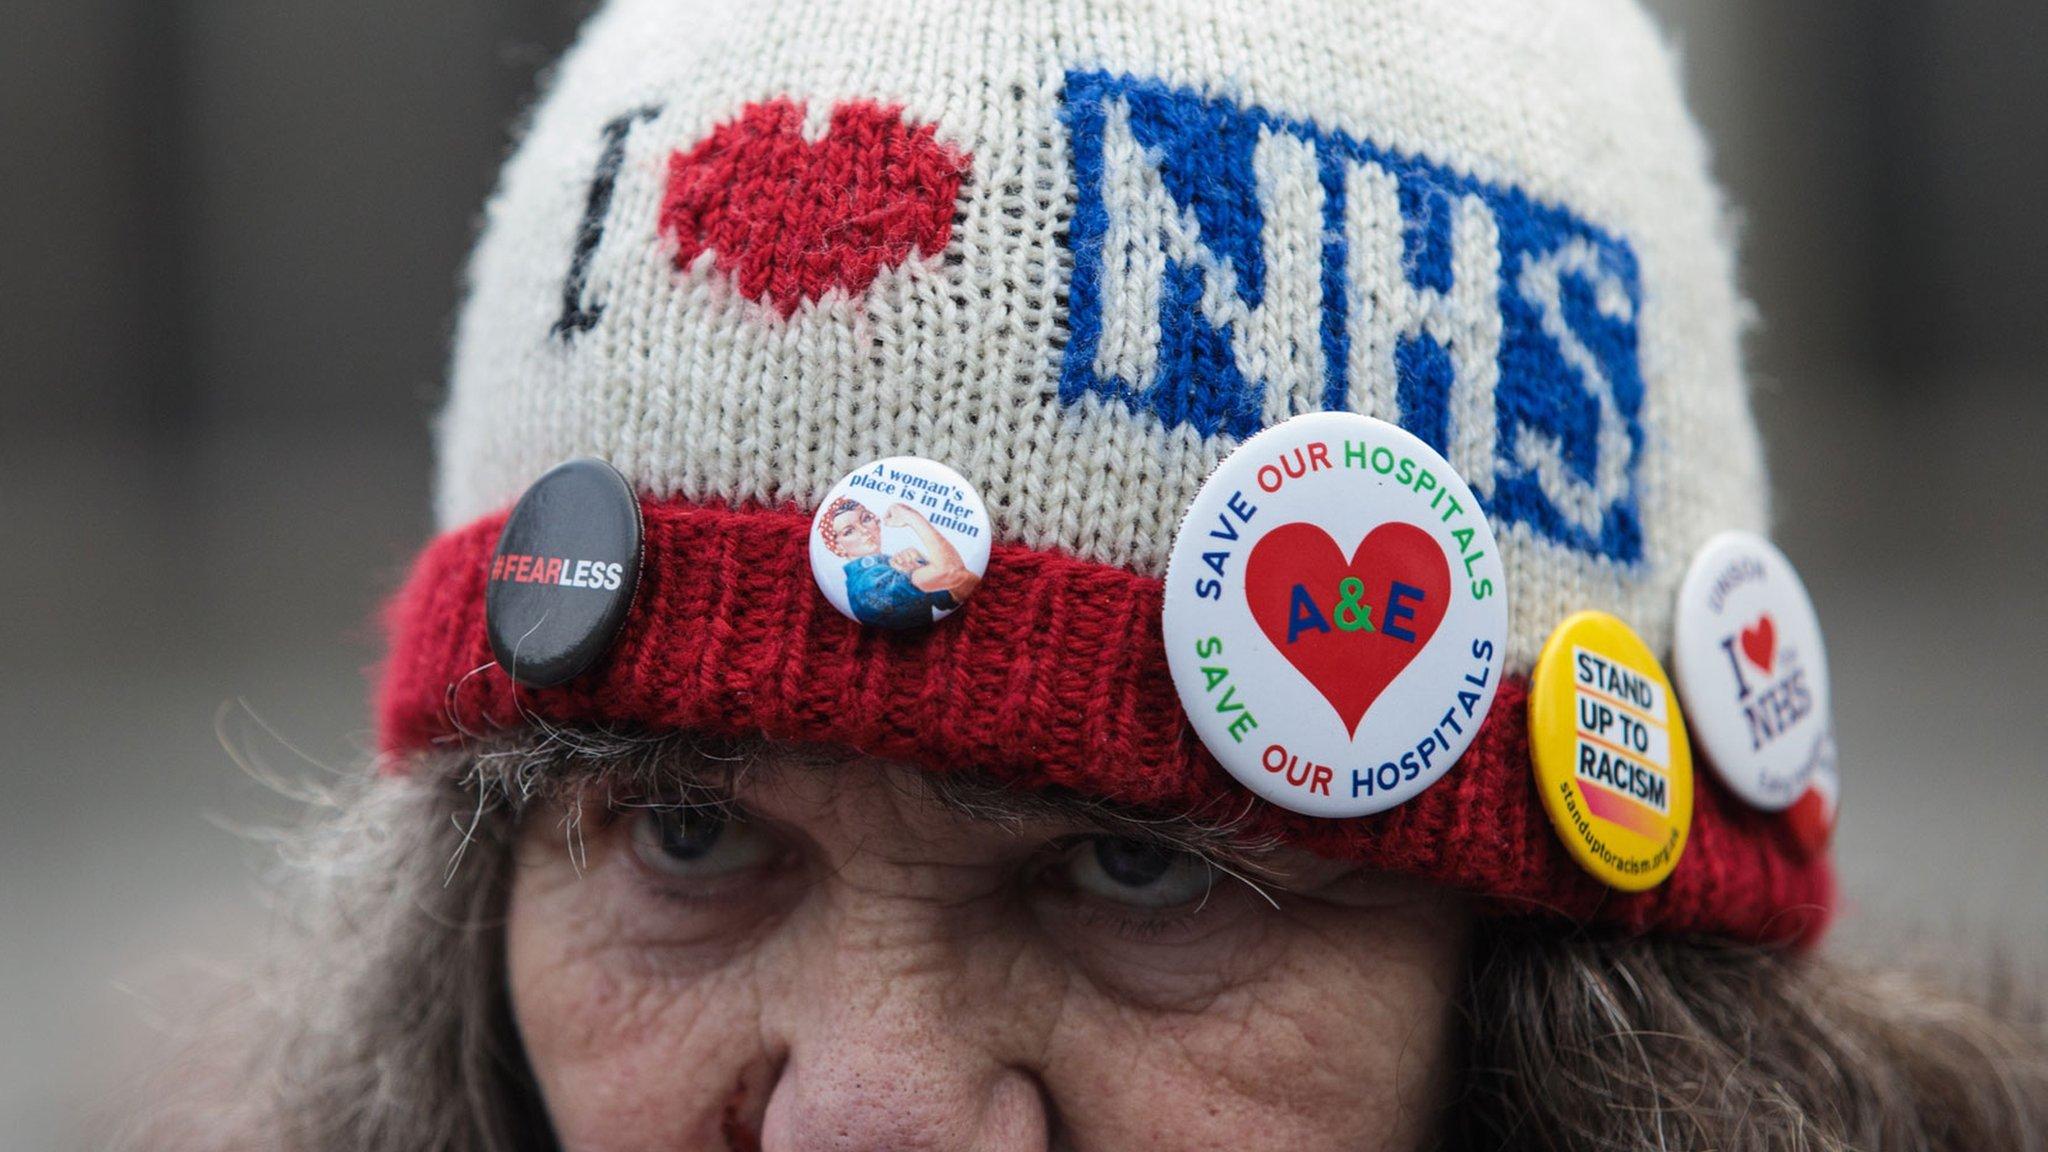 British Attitudes Survey: More Britons 'back higher taxes'